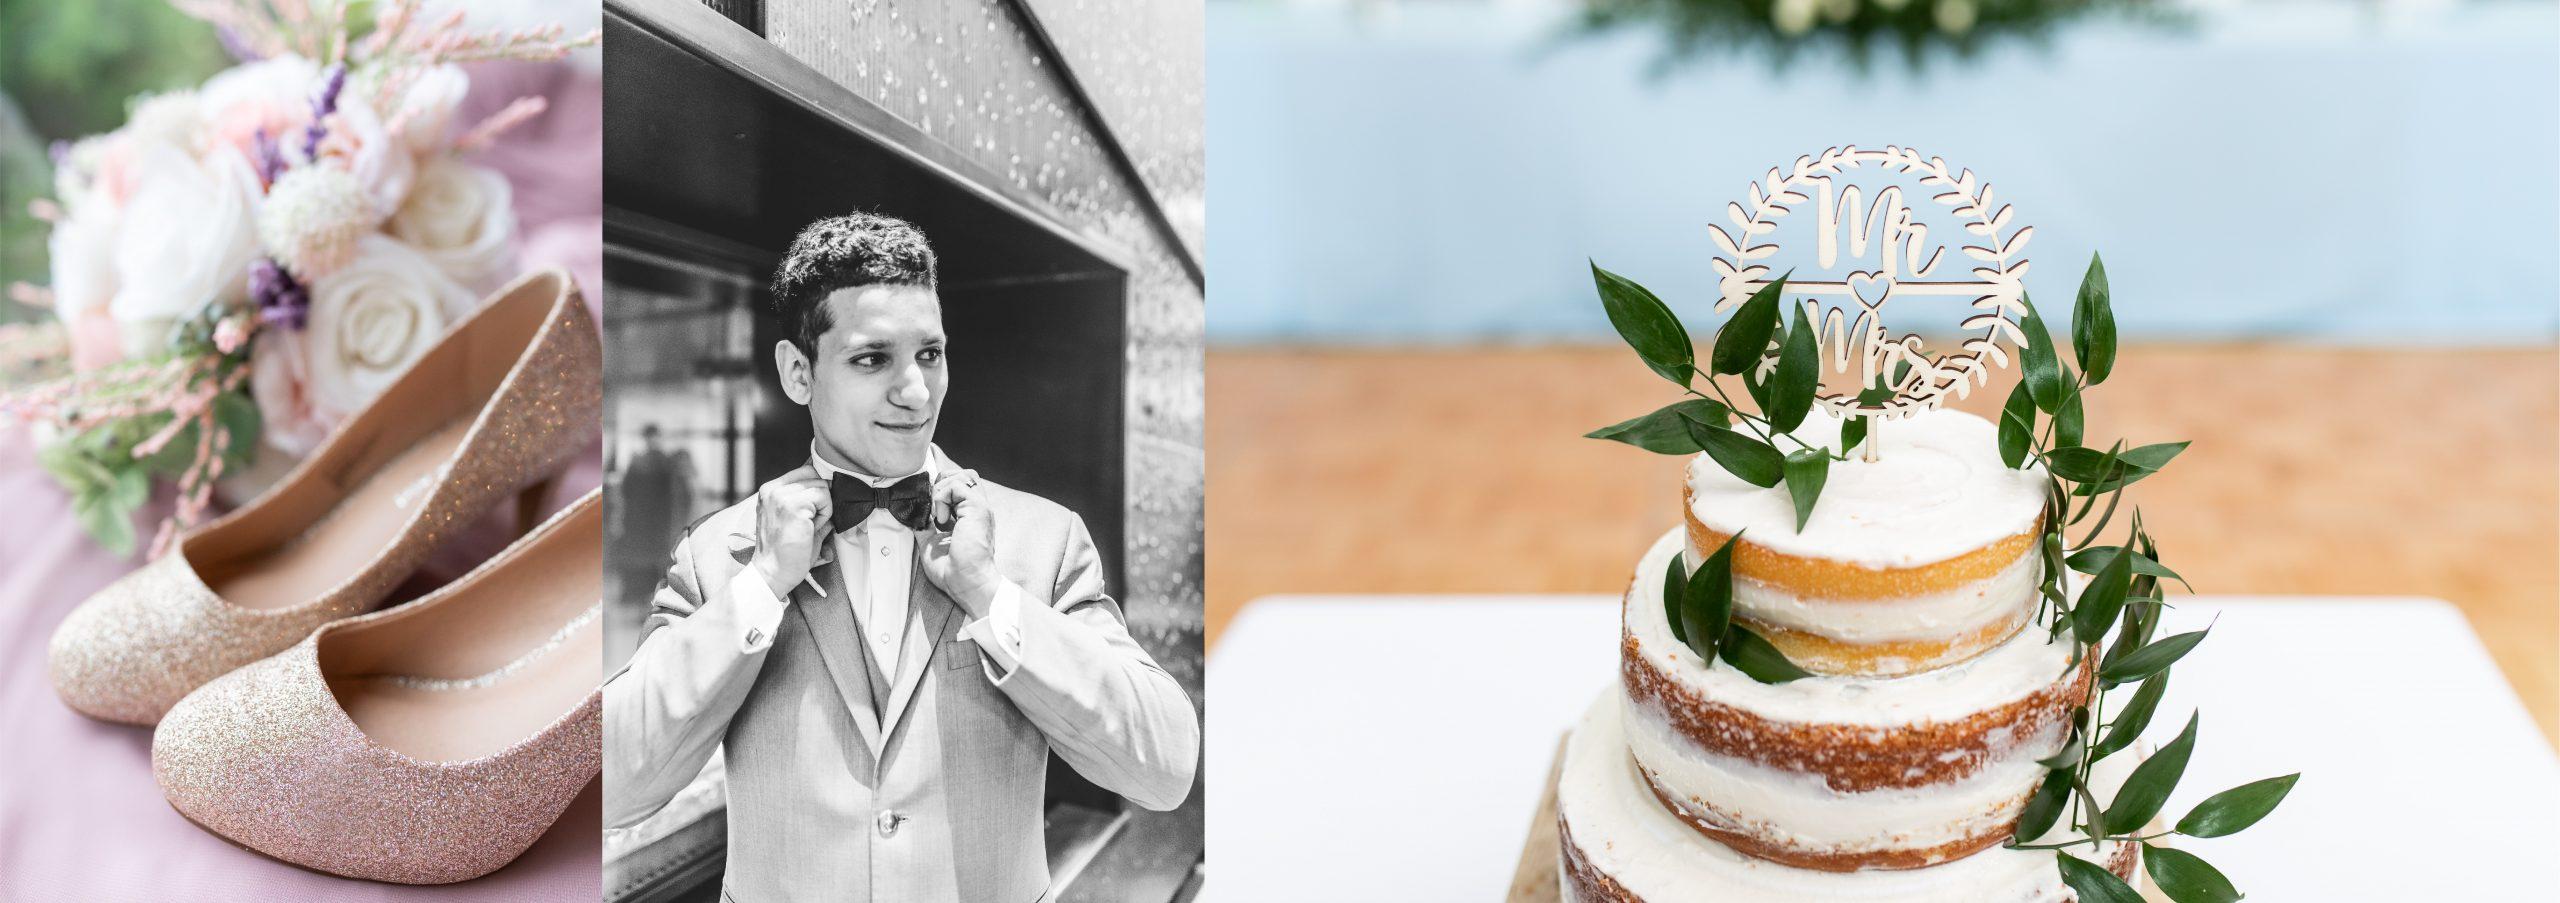 kandra-lynn-photography-michigan-wedding-photographer-03